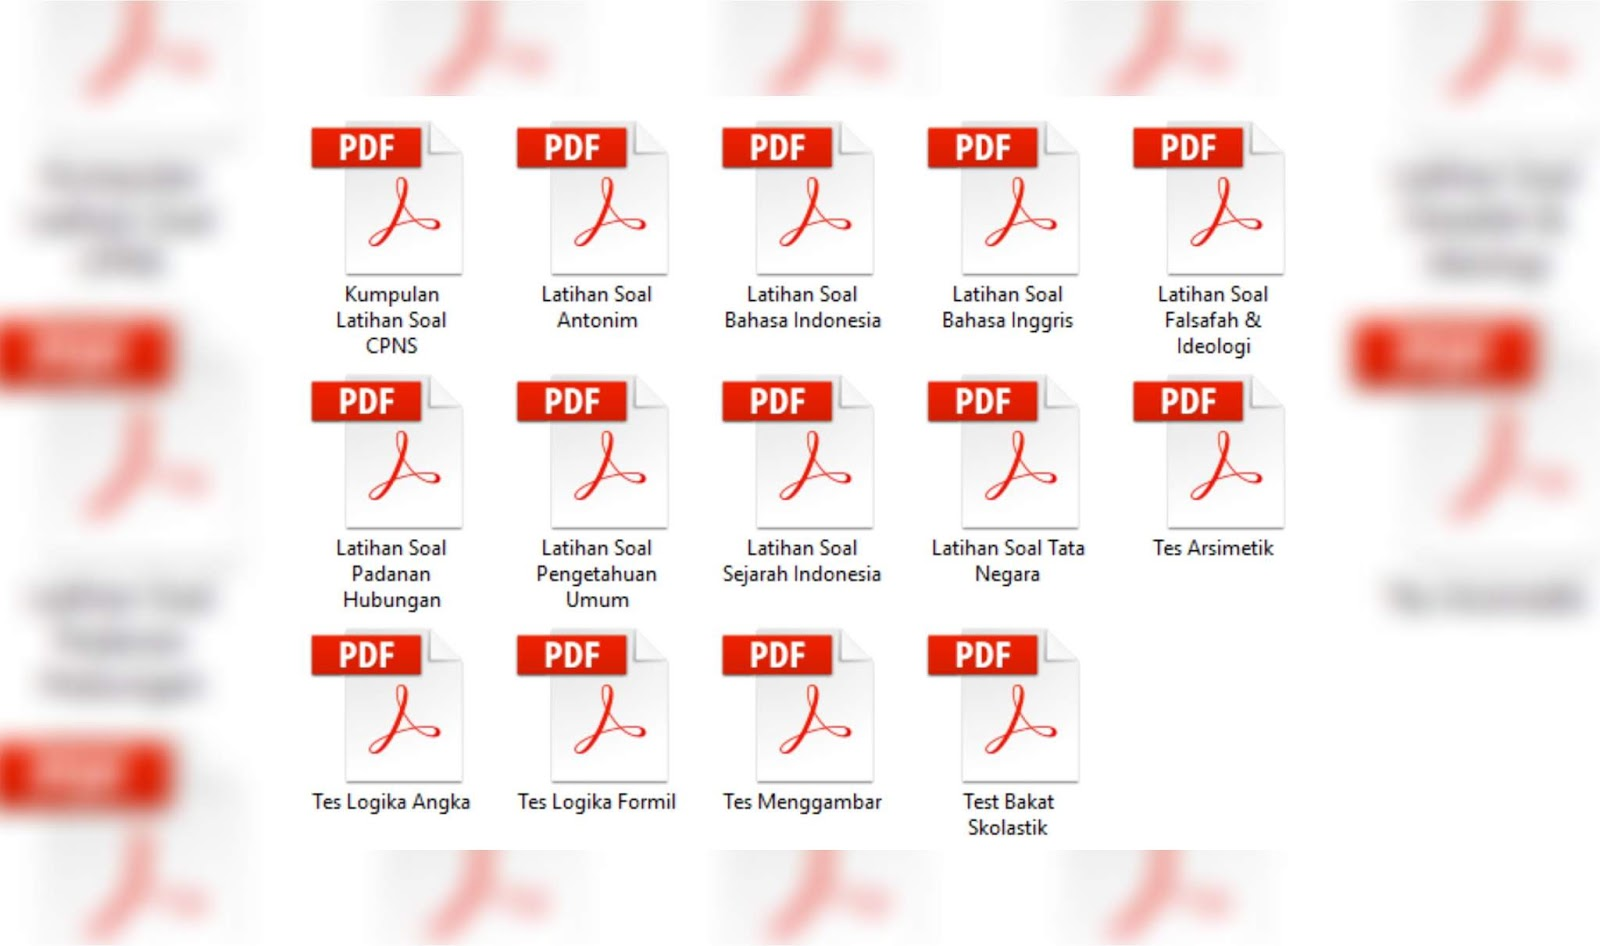 Download Kumpulan Pdf Latihan Soal Cpns Beserta Kunci Jawabannya